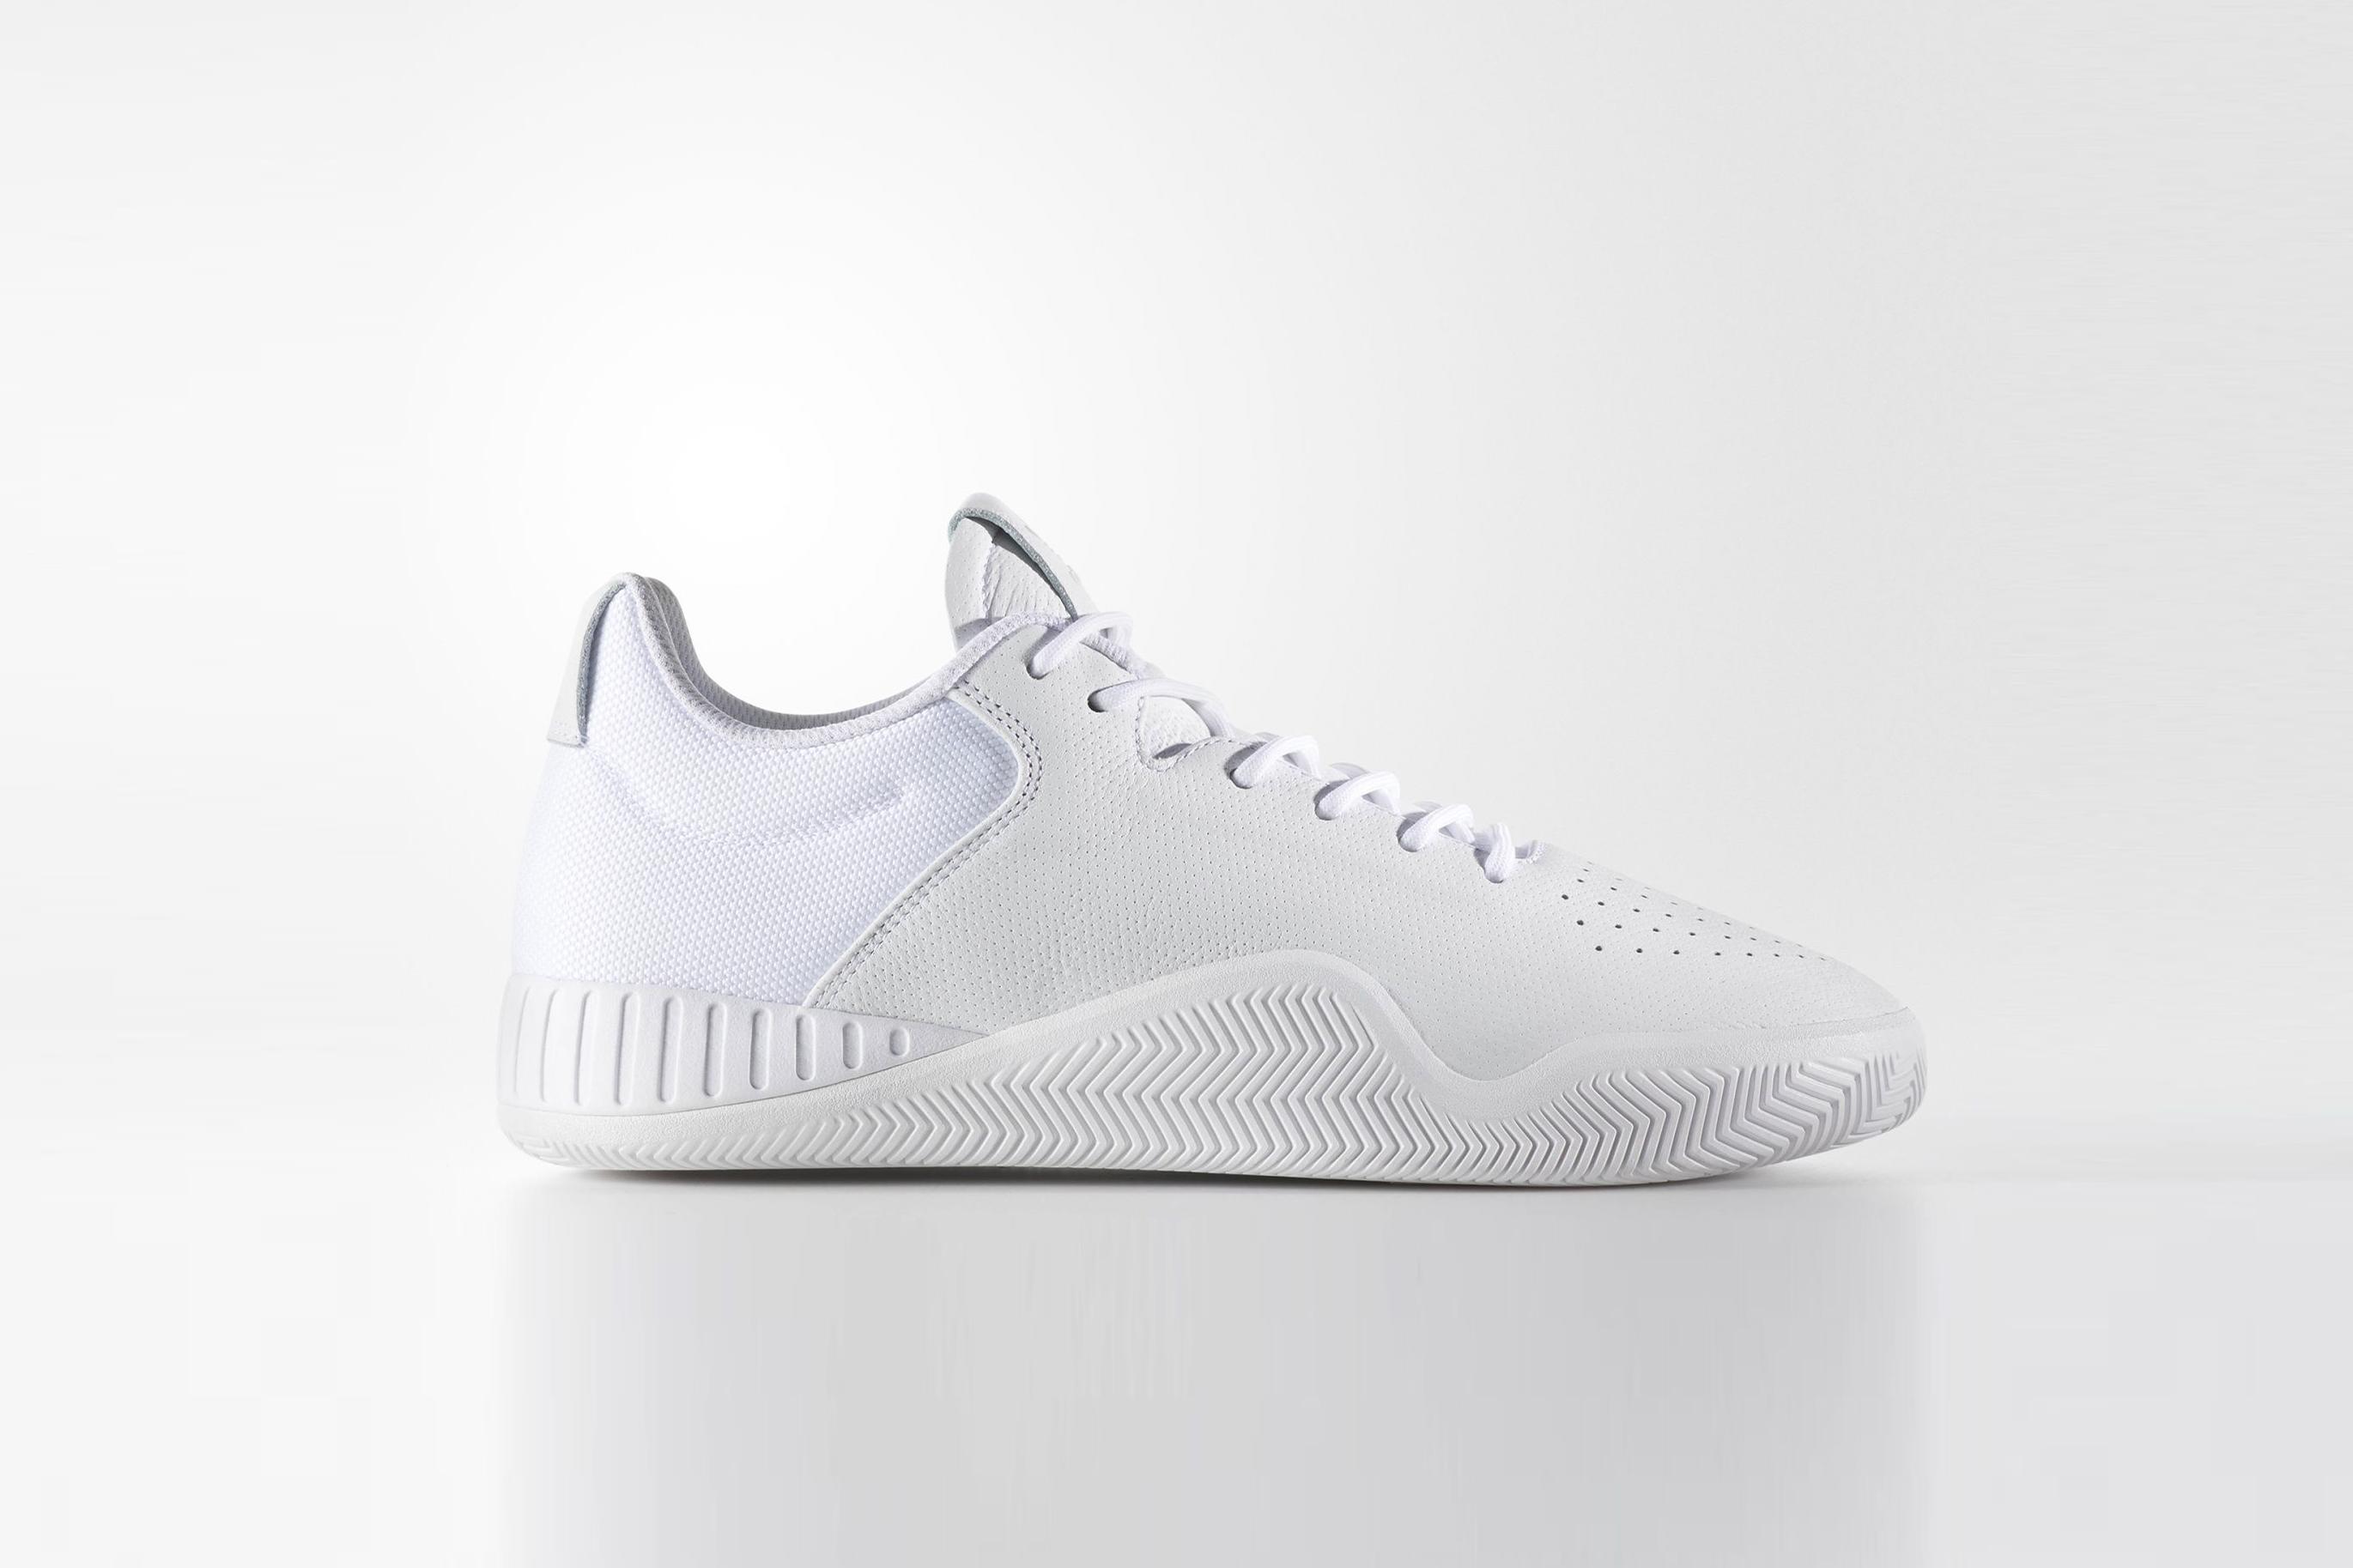 e334777e83bc8 Catch adidas Consortium s